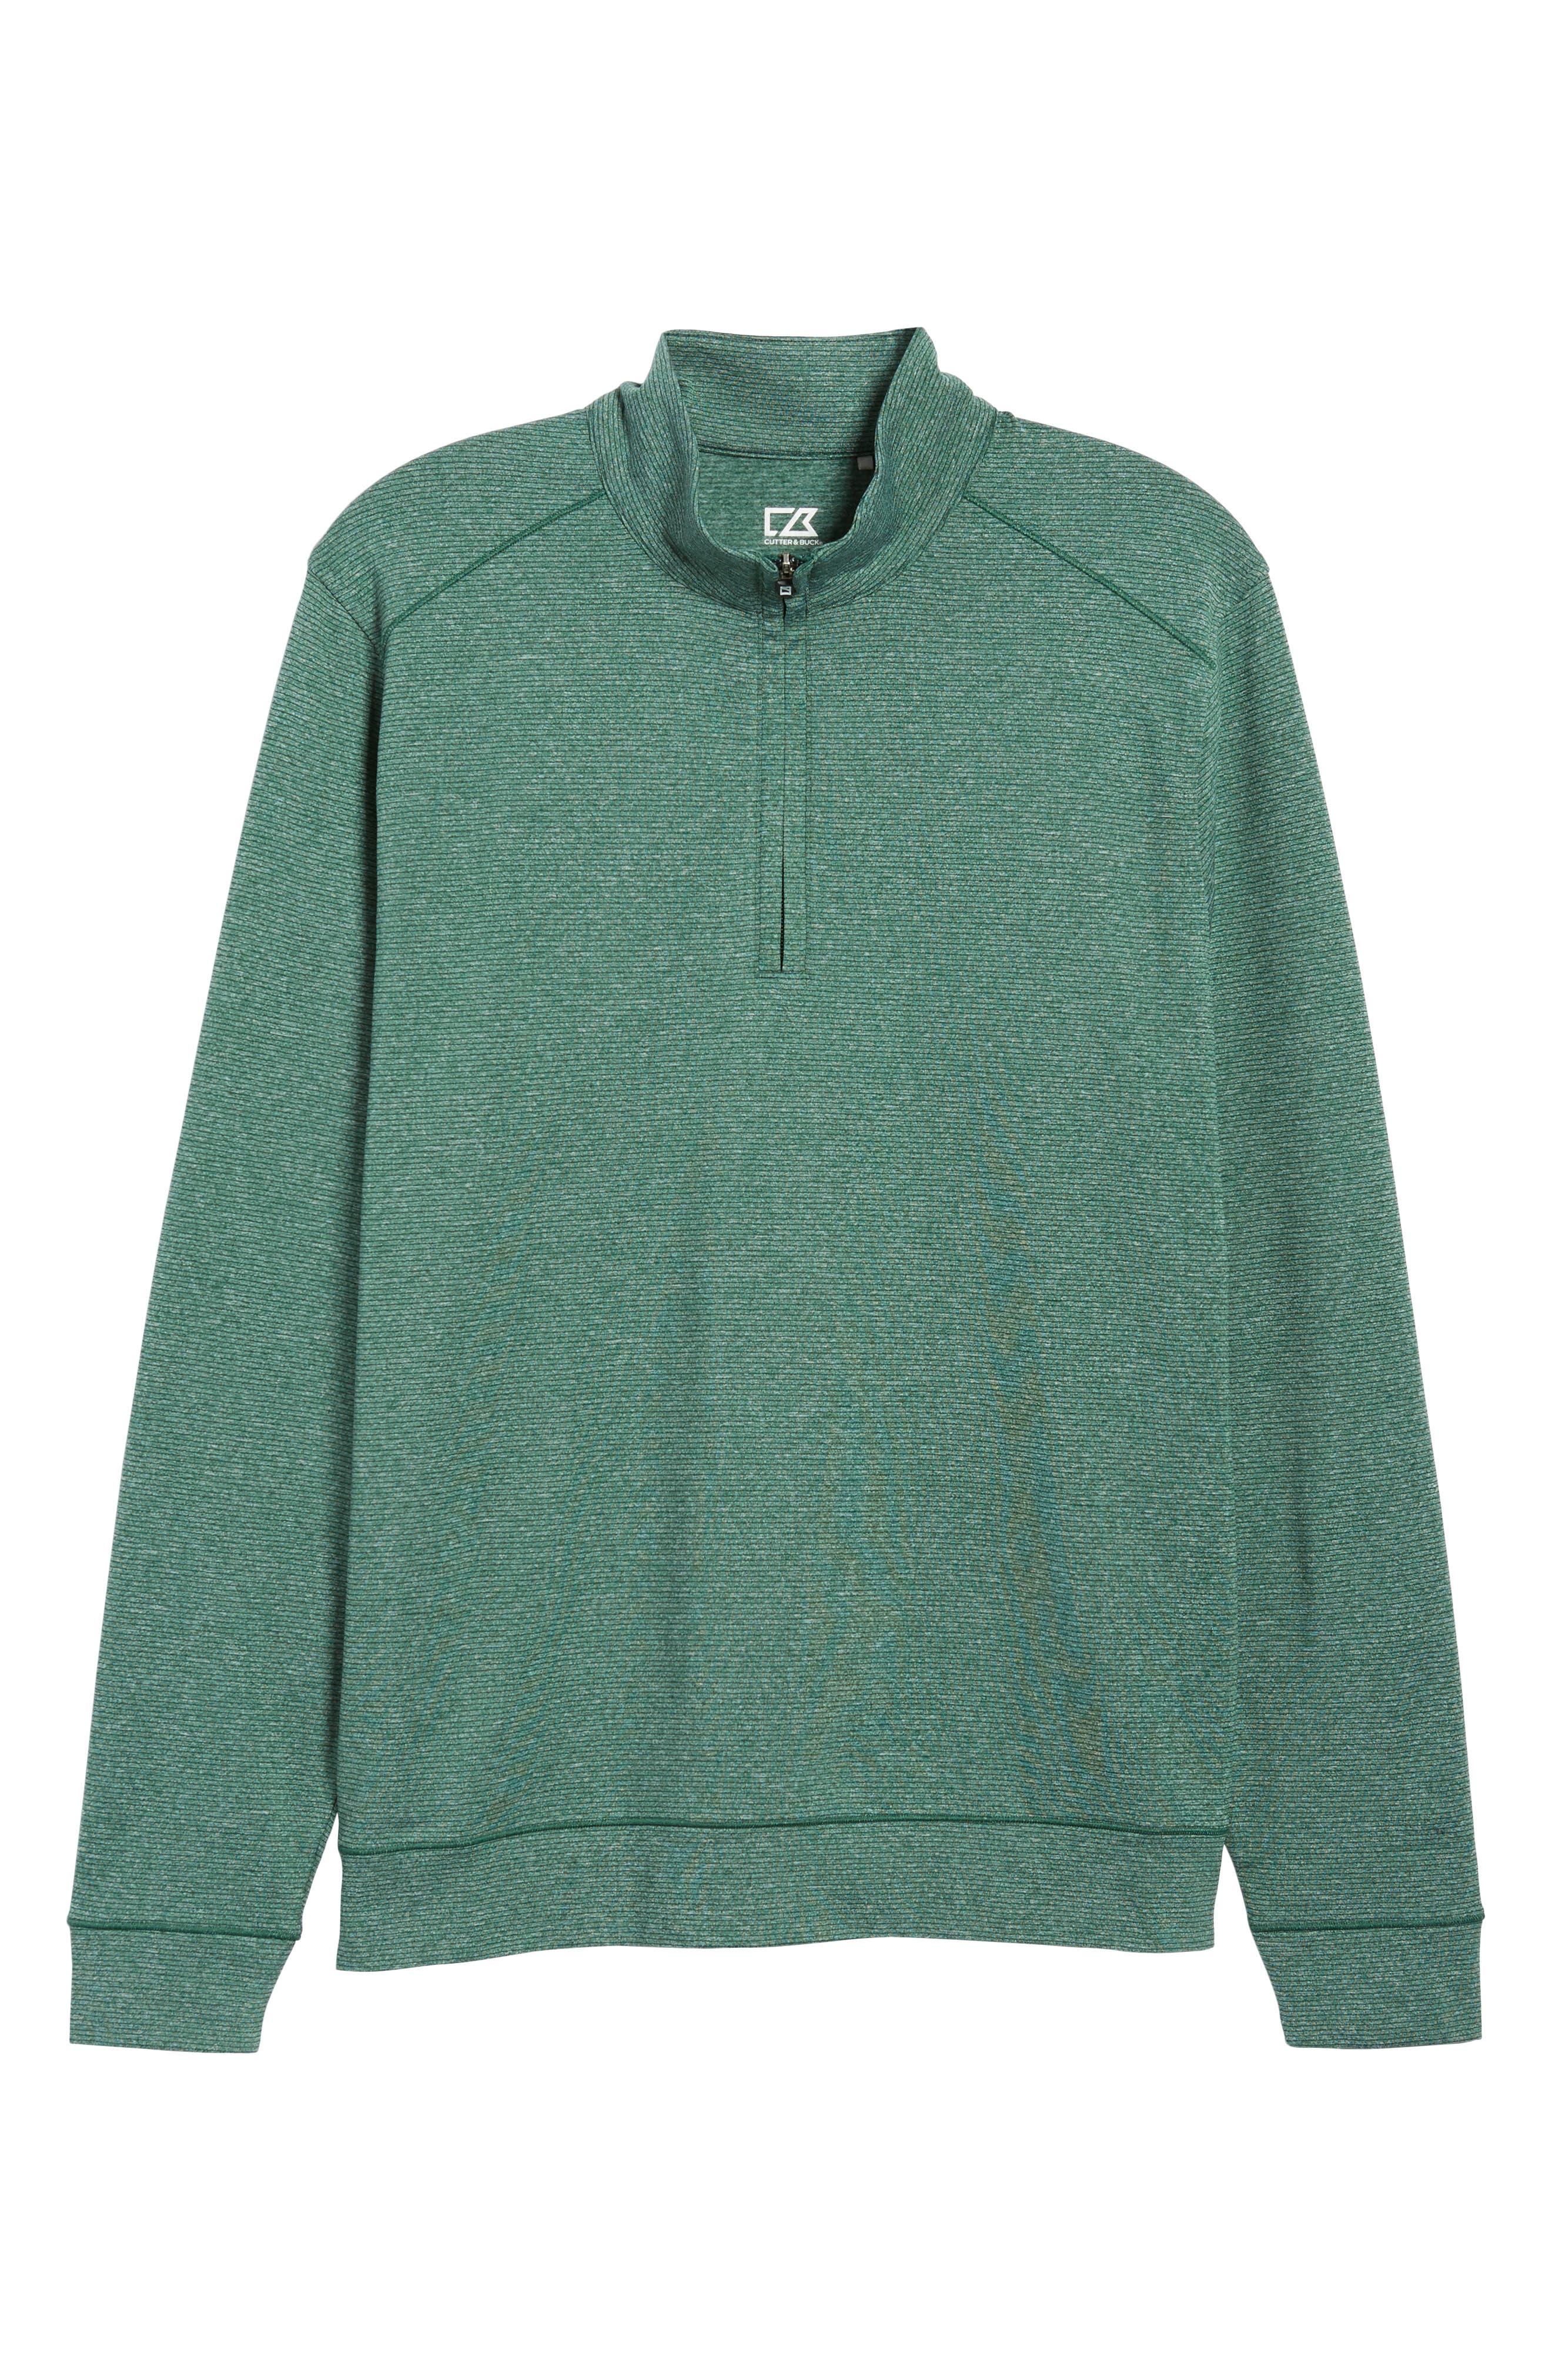 Shoreline Classic Fit Half Zip Pullover,                             Alternate thumbnail 6, color,                             HUNTER HEATHER